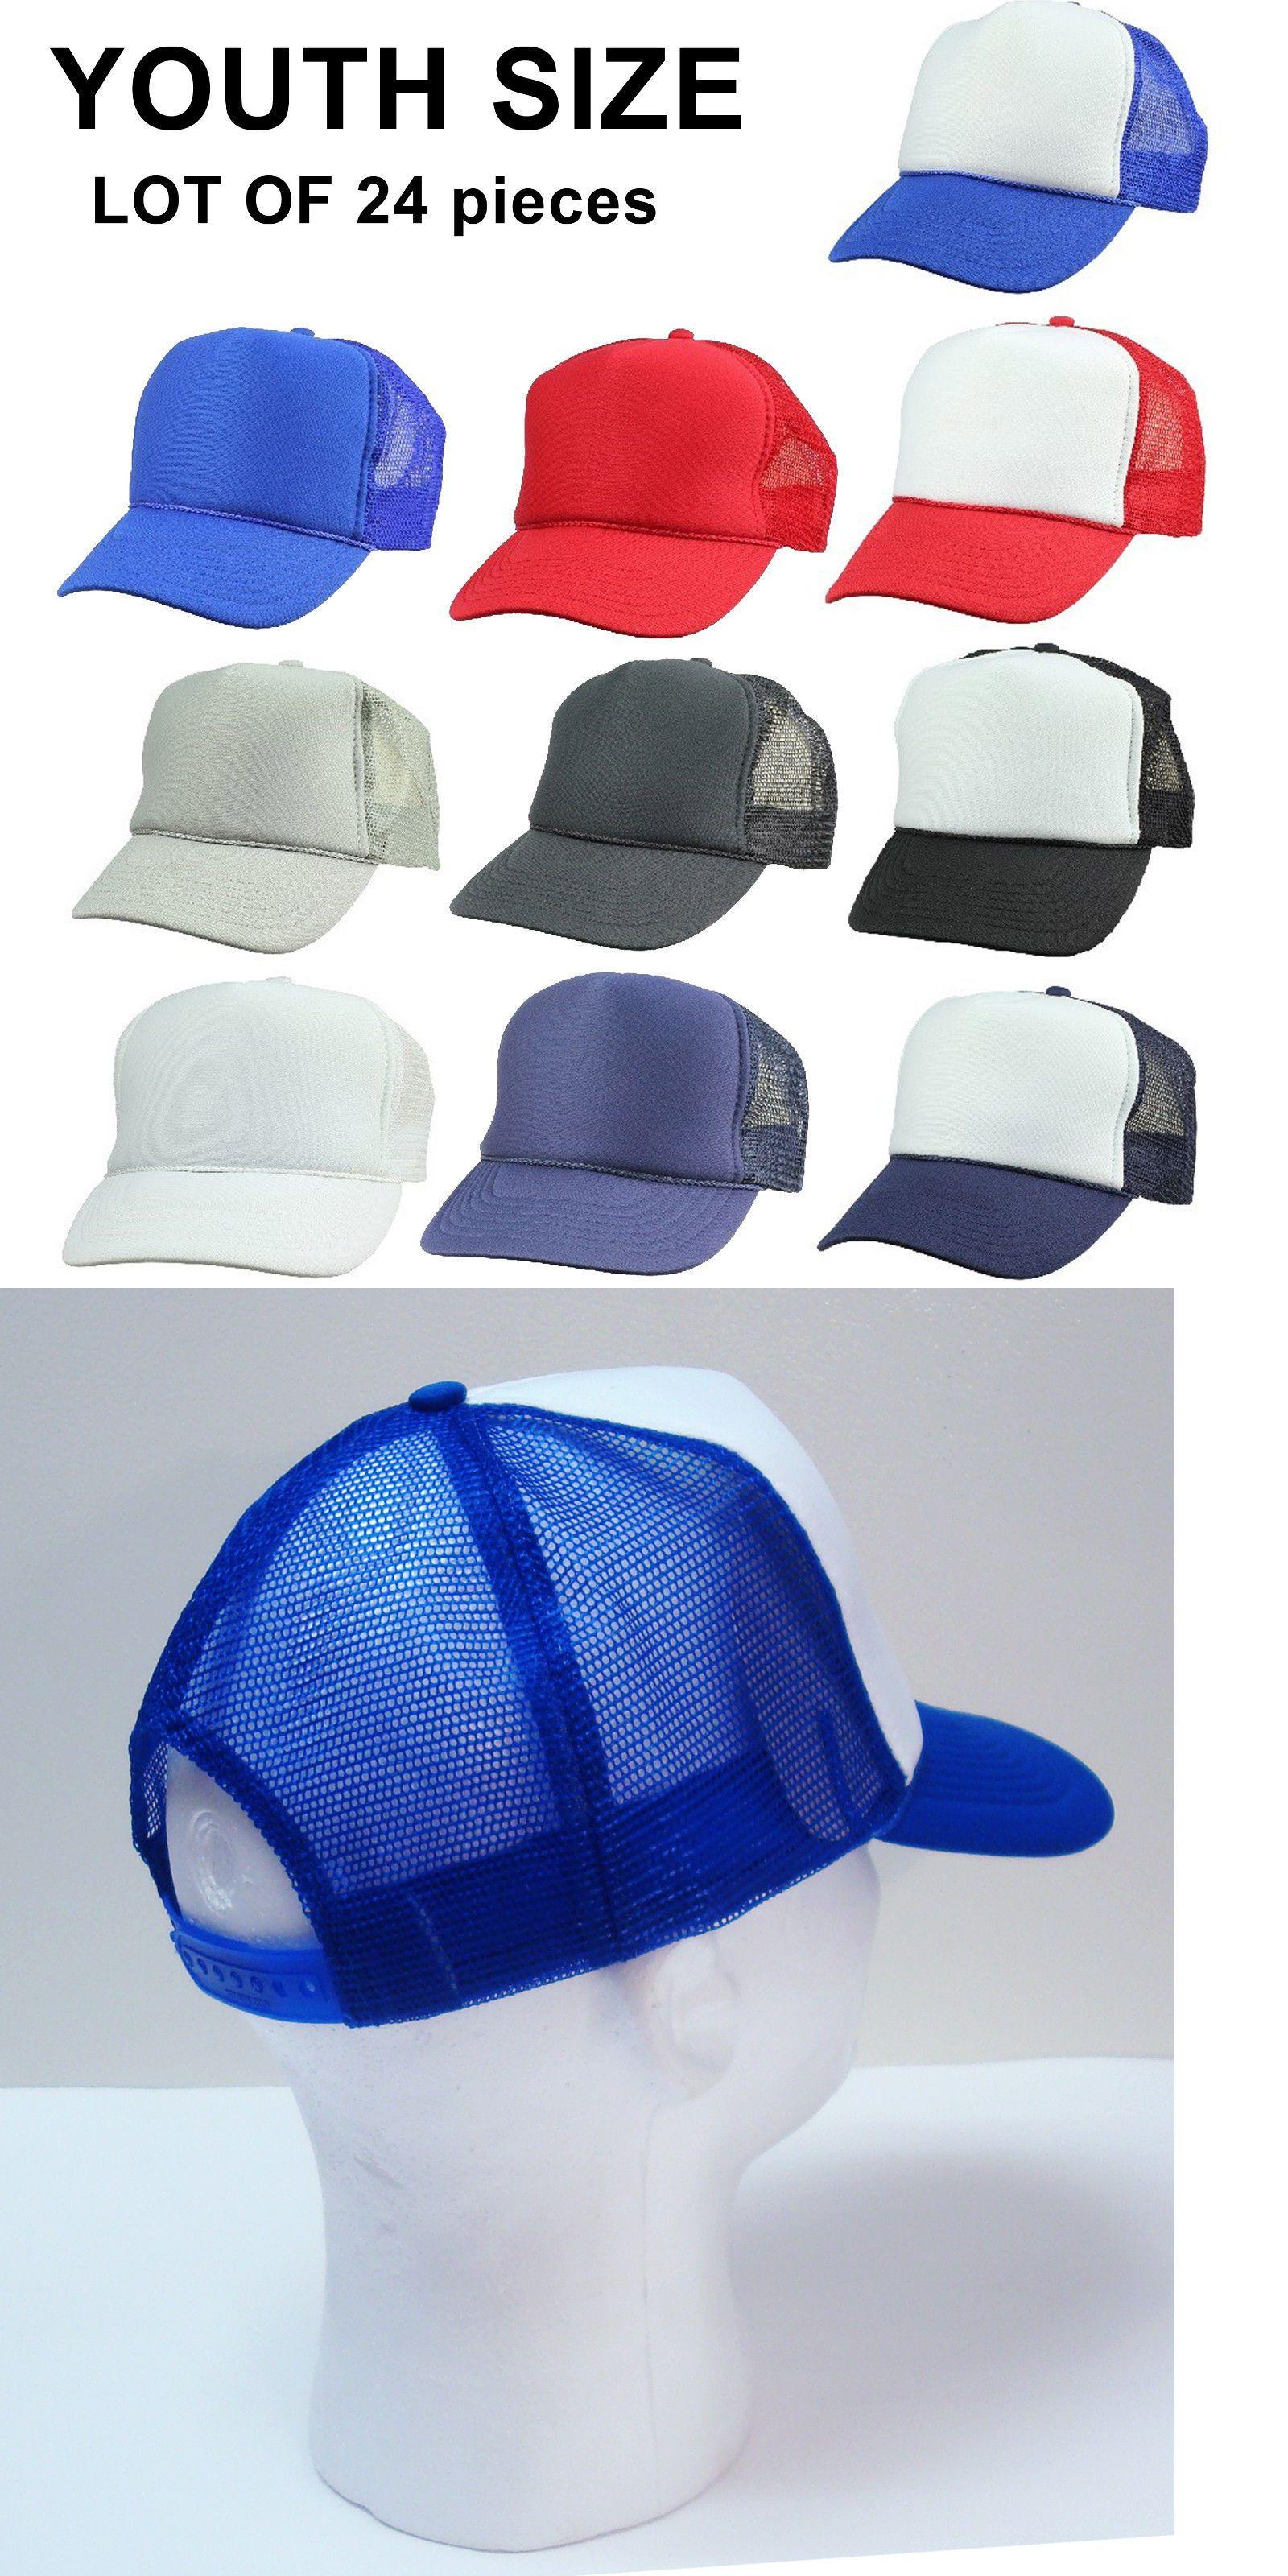 Mens Accessories 45053  Youth Size ~ 24 Trucker Hats Wholesale Bulk Lot 2  Dozen Mesh Caps ~ Child Kids -  BUY IT NOW ONLY   70 on eBay! dd38e3bbc28